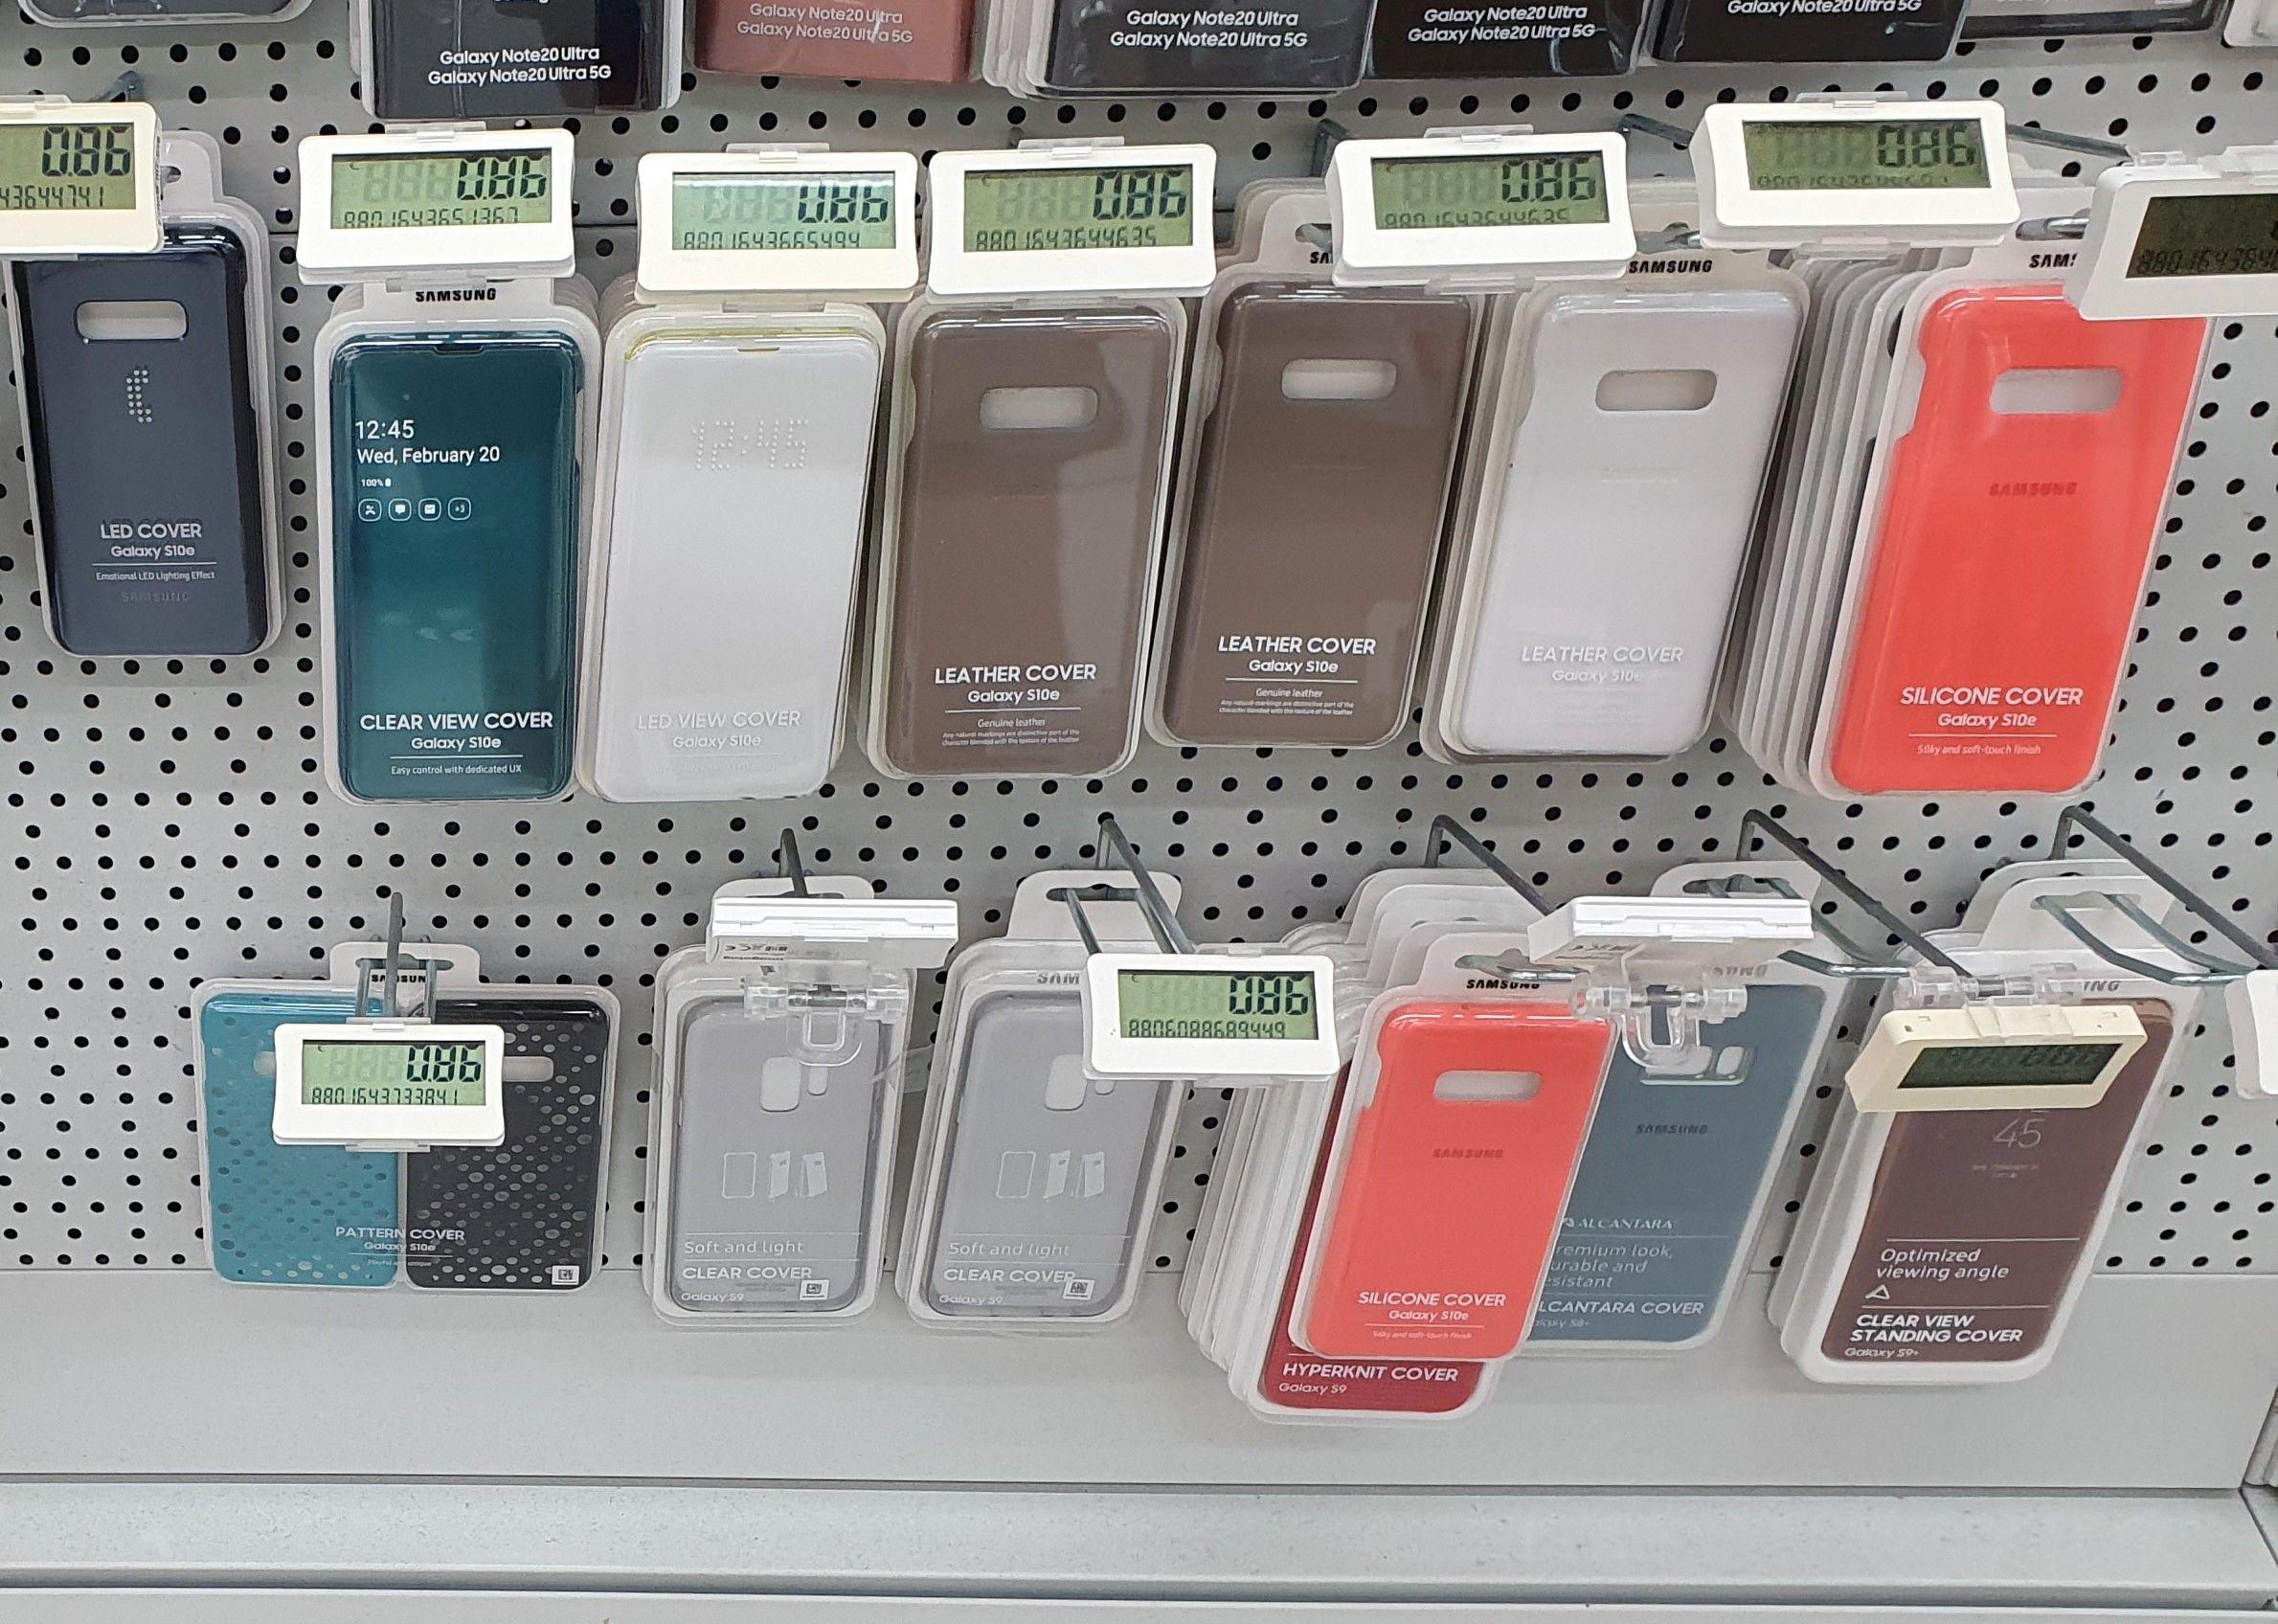 Lokal Saturn Karlsruhe Durlach Diverse original Samsung Cover und Cases für Galaxy S10, S10e, S10+, S9, S8, A70...